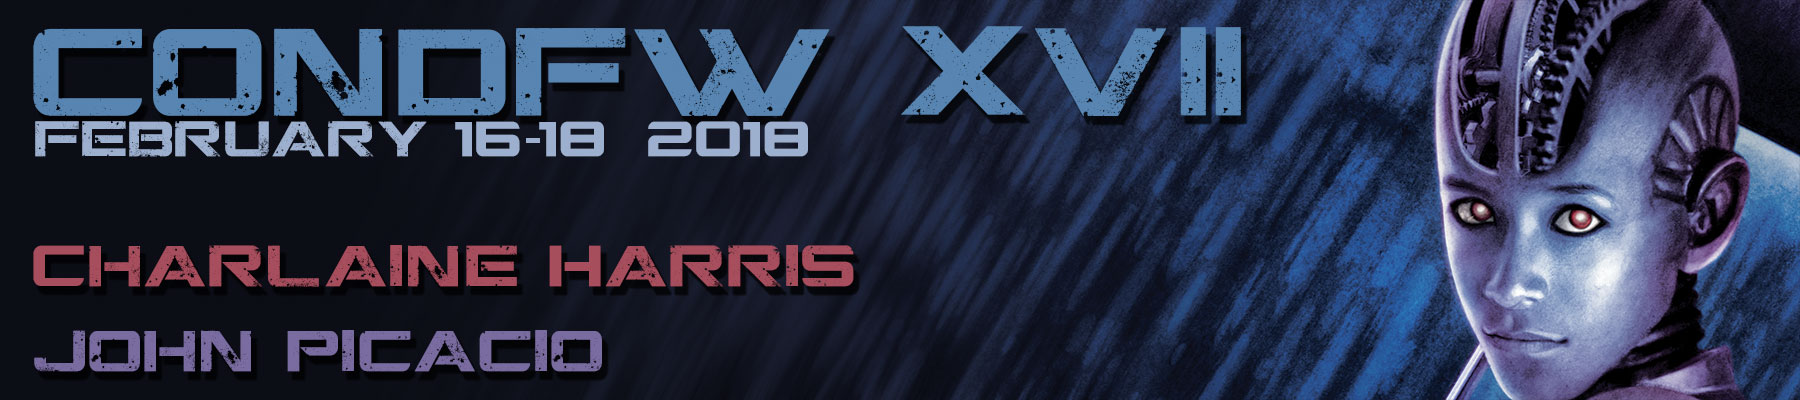 ConDFW XVII